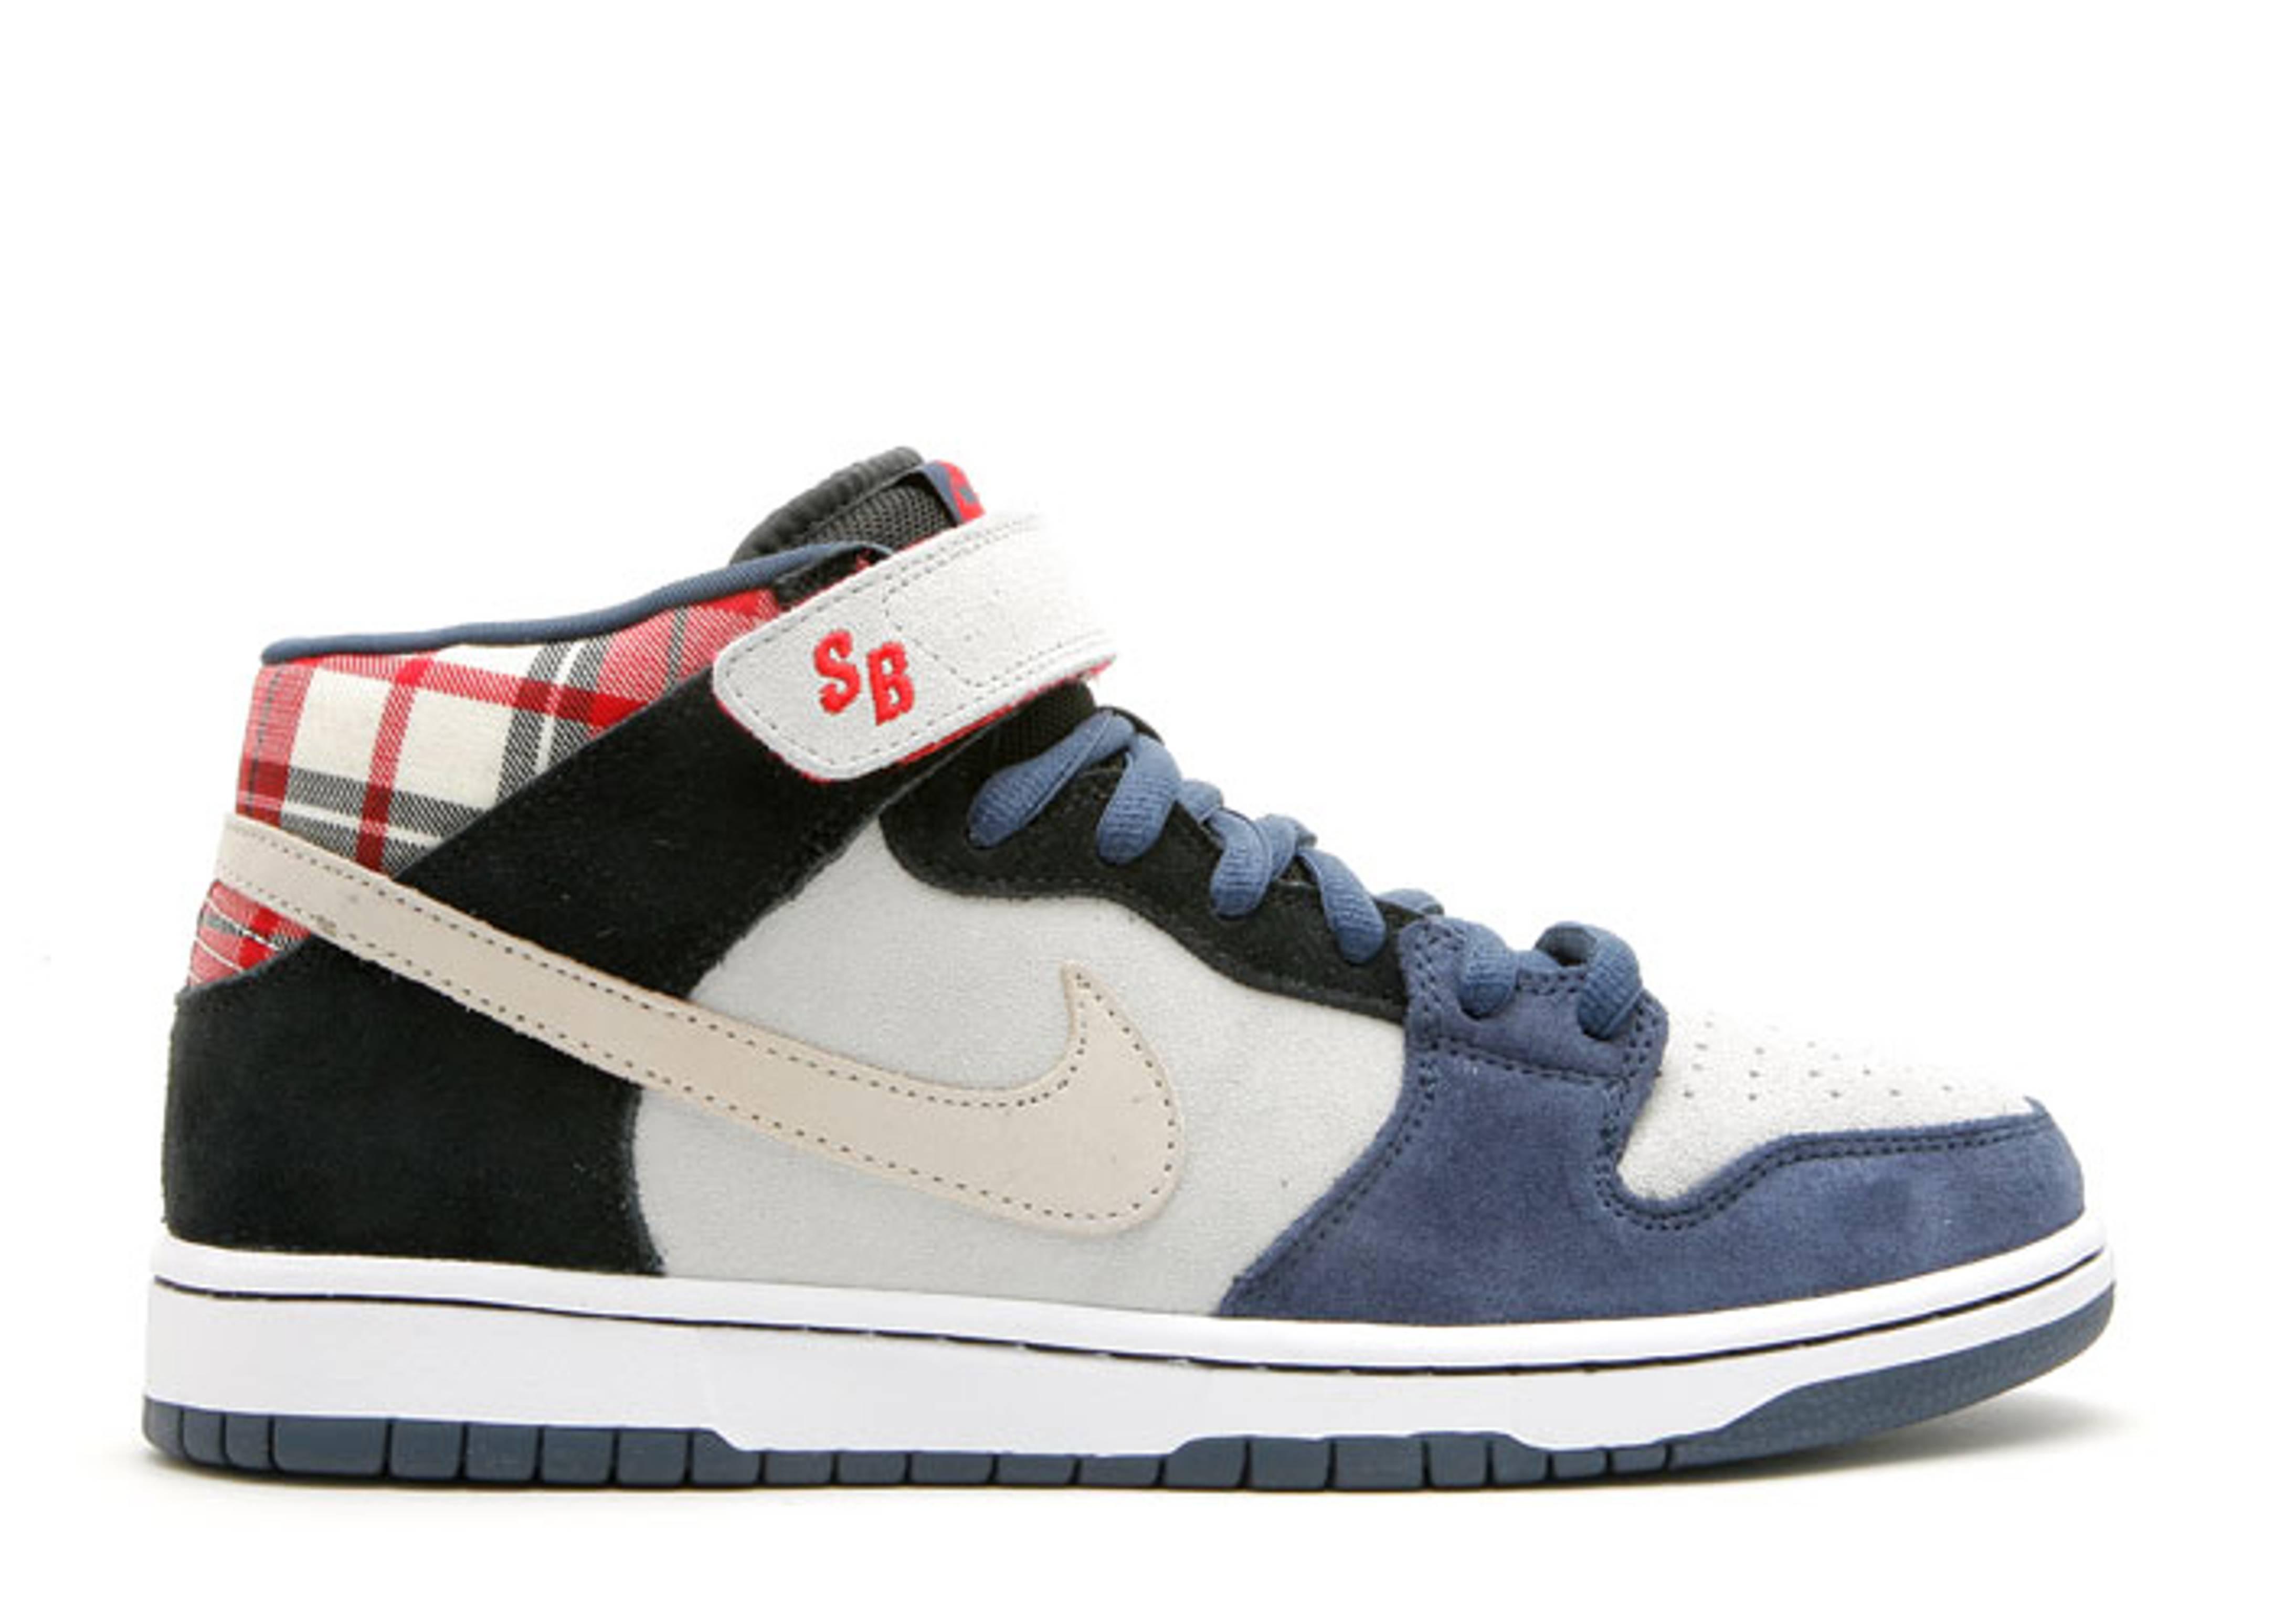 Nike Sb Dunk Chico Blanco Mediados hacer un pedido btBiyiwnk